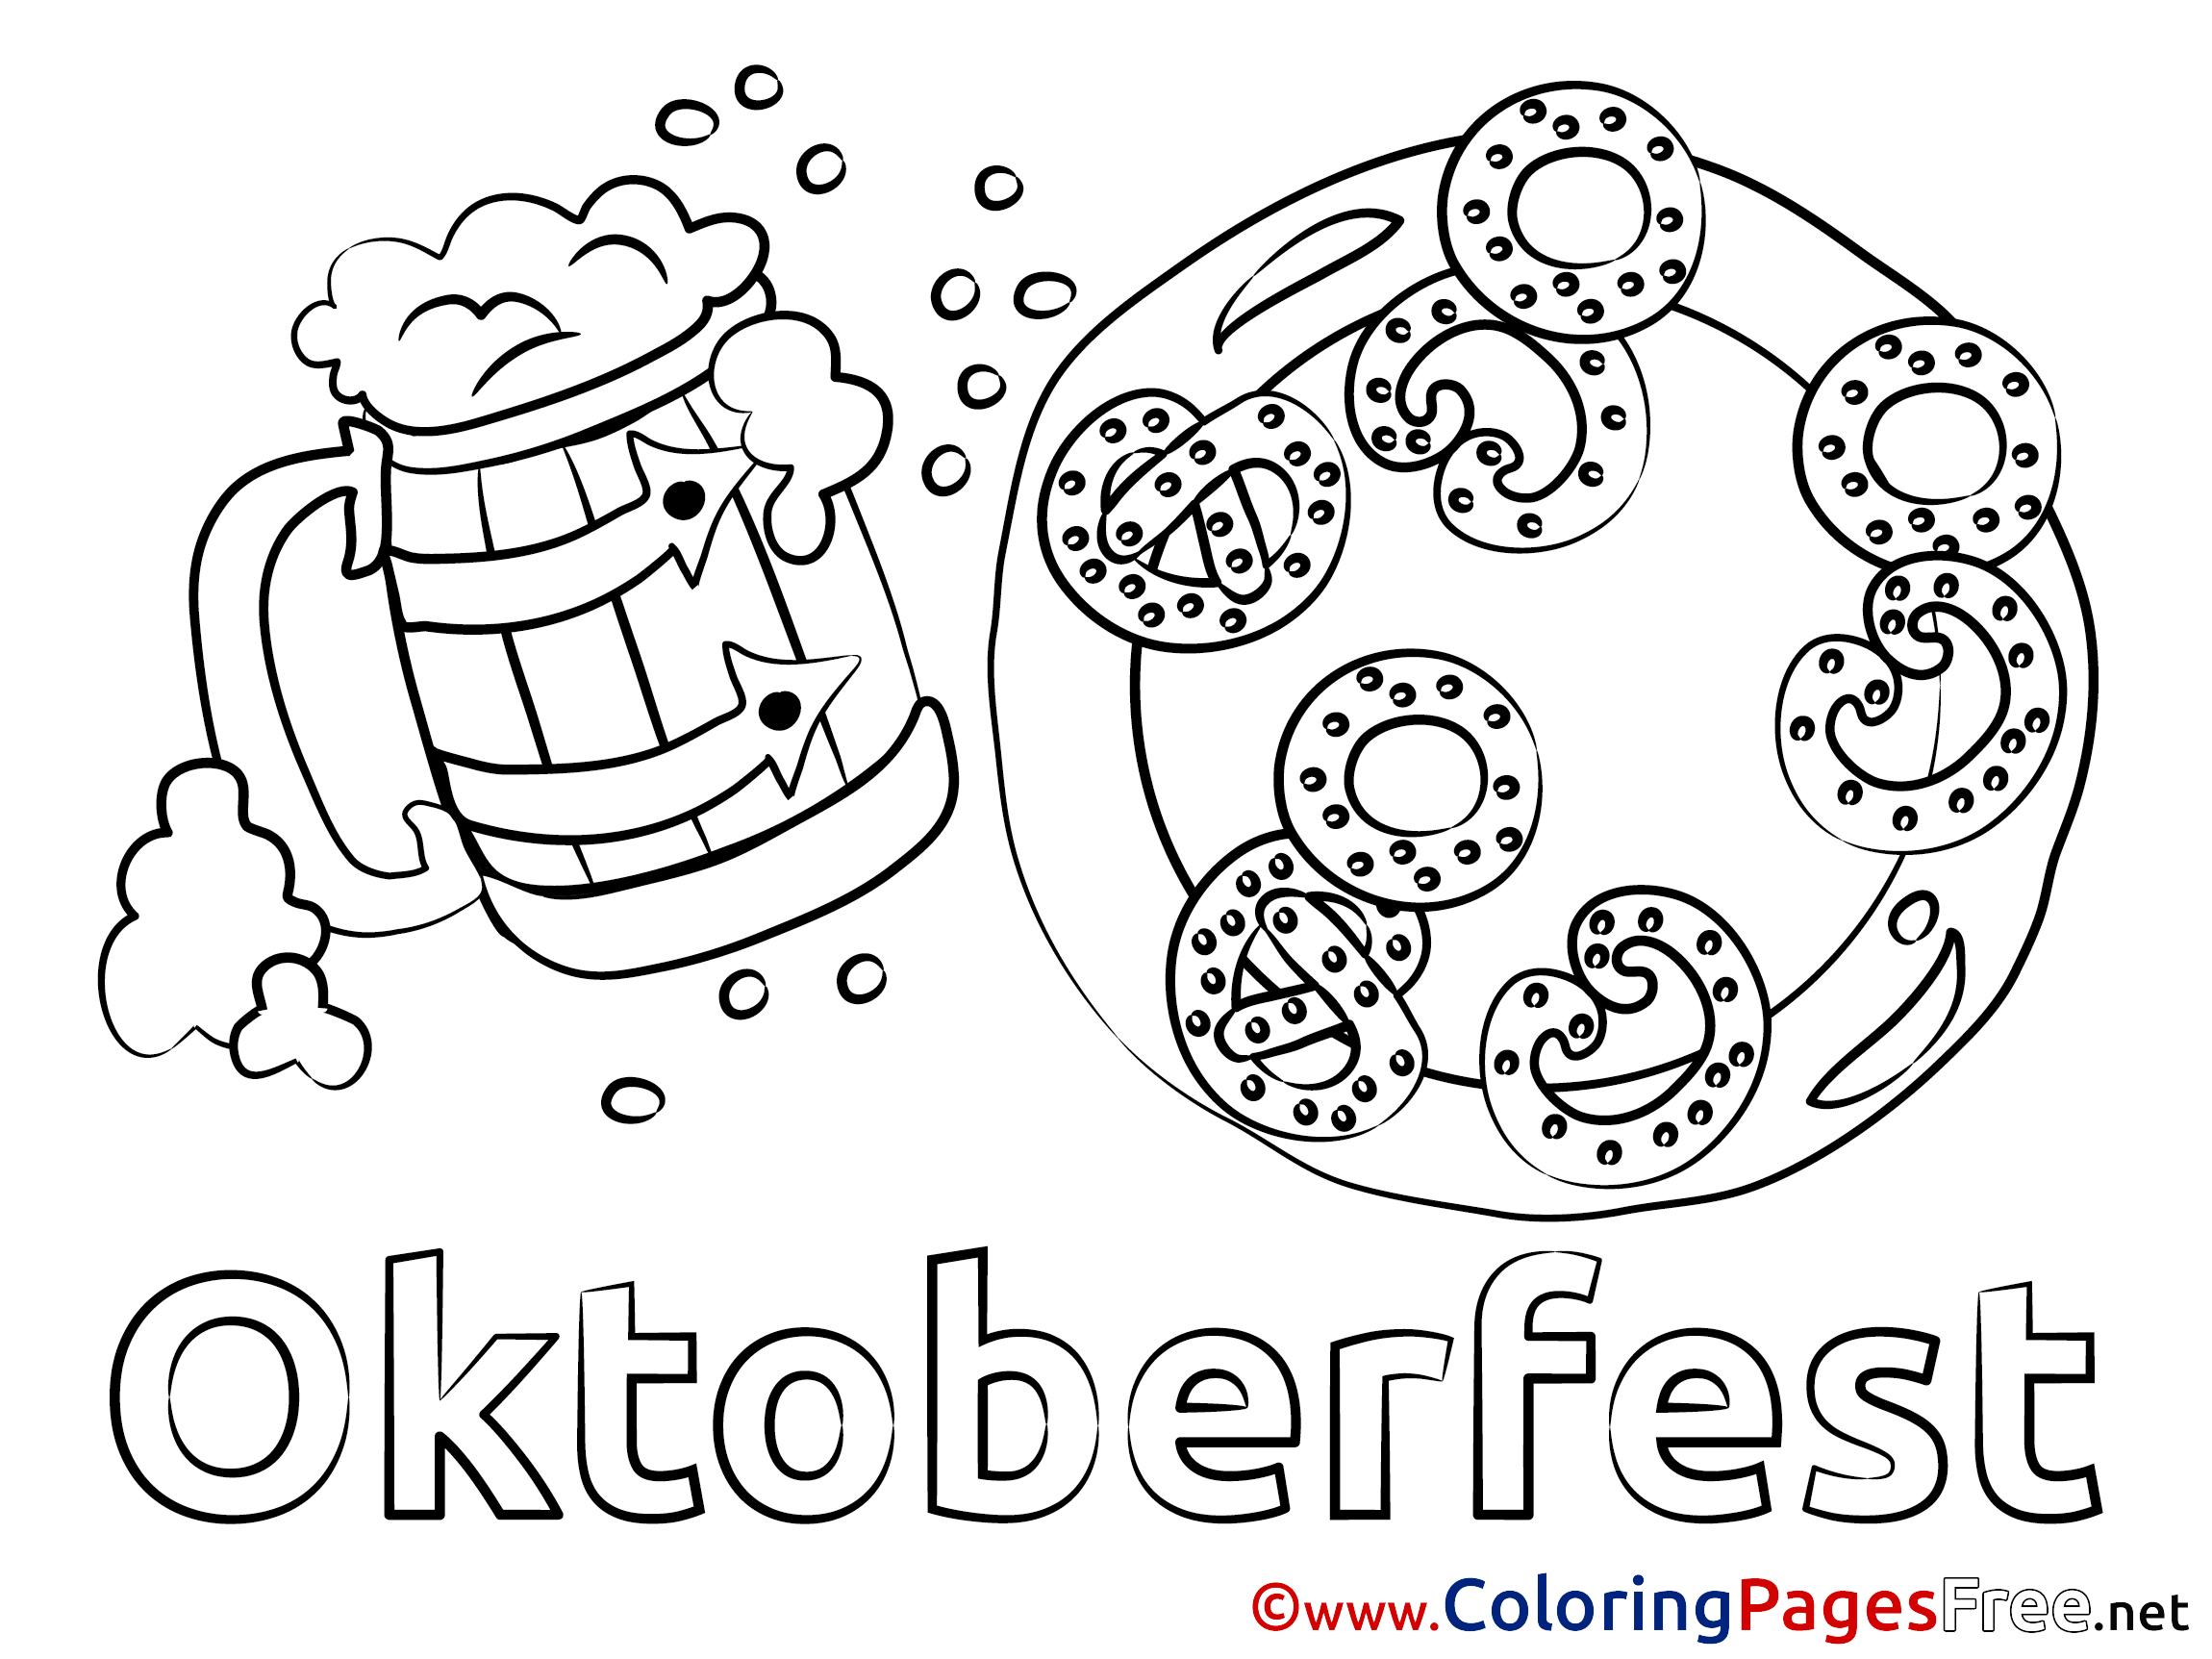 ausmalbilder oktoberfest   ausmalbilder   Oktoberfest   1725x2300